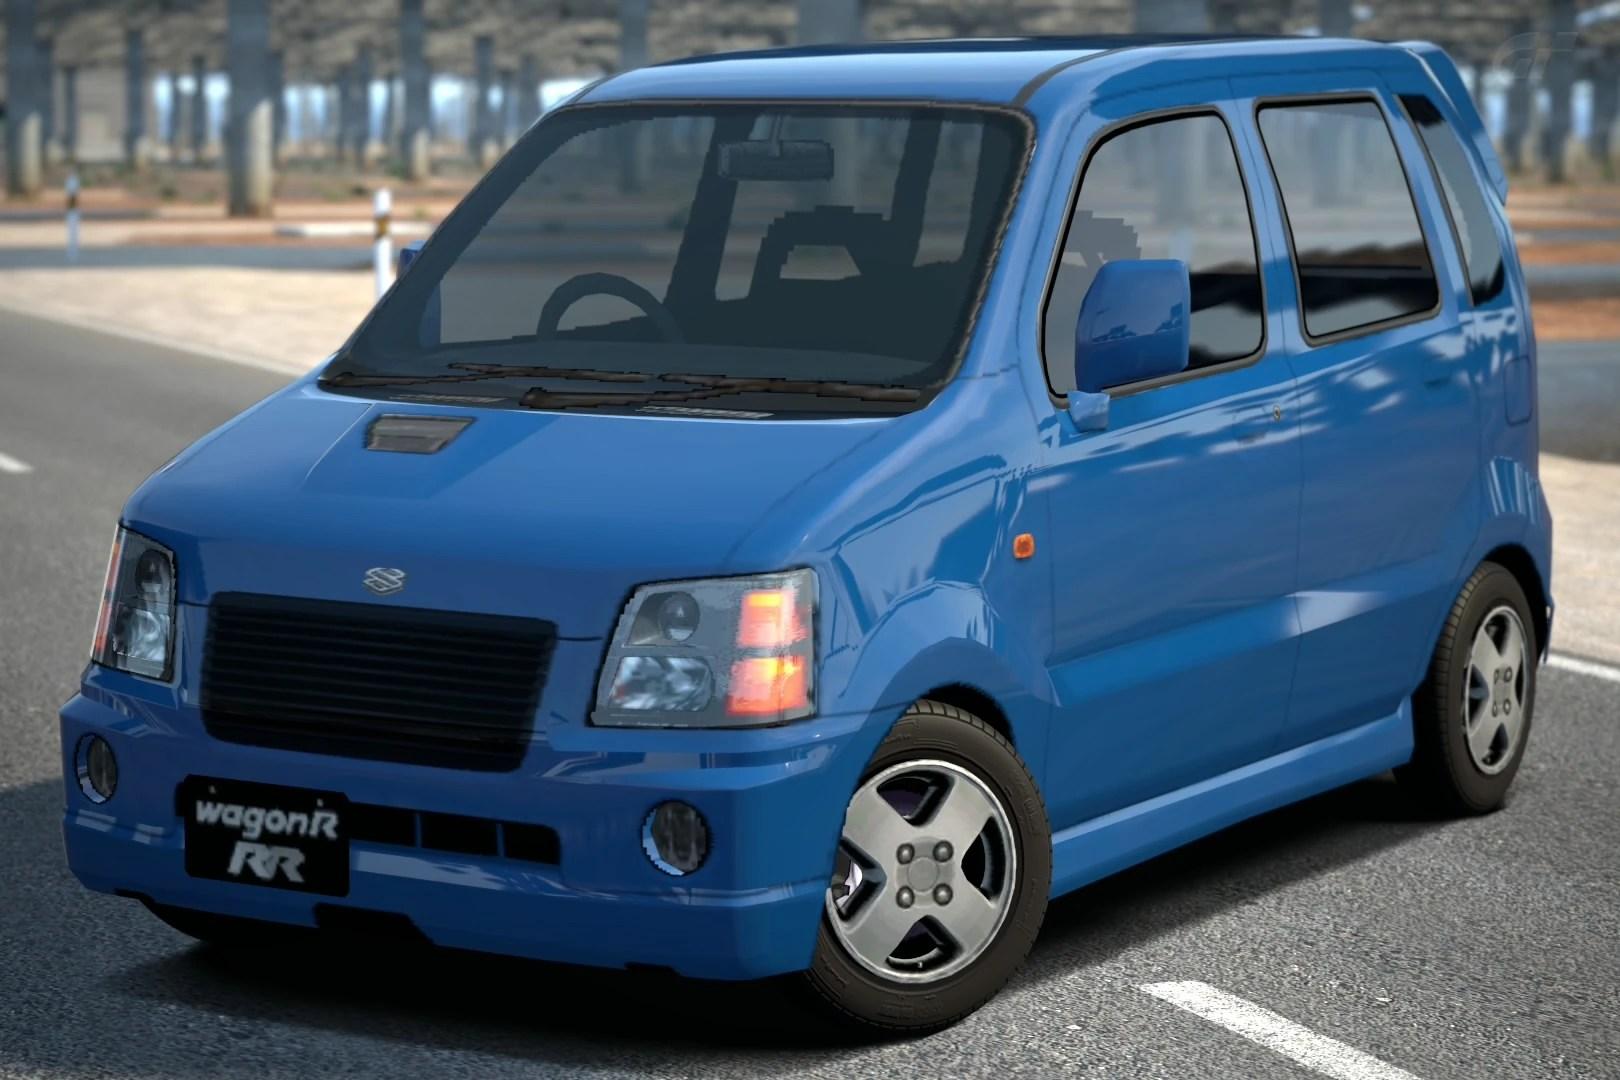 hight resolution of suzuki wagon r rr 98